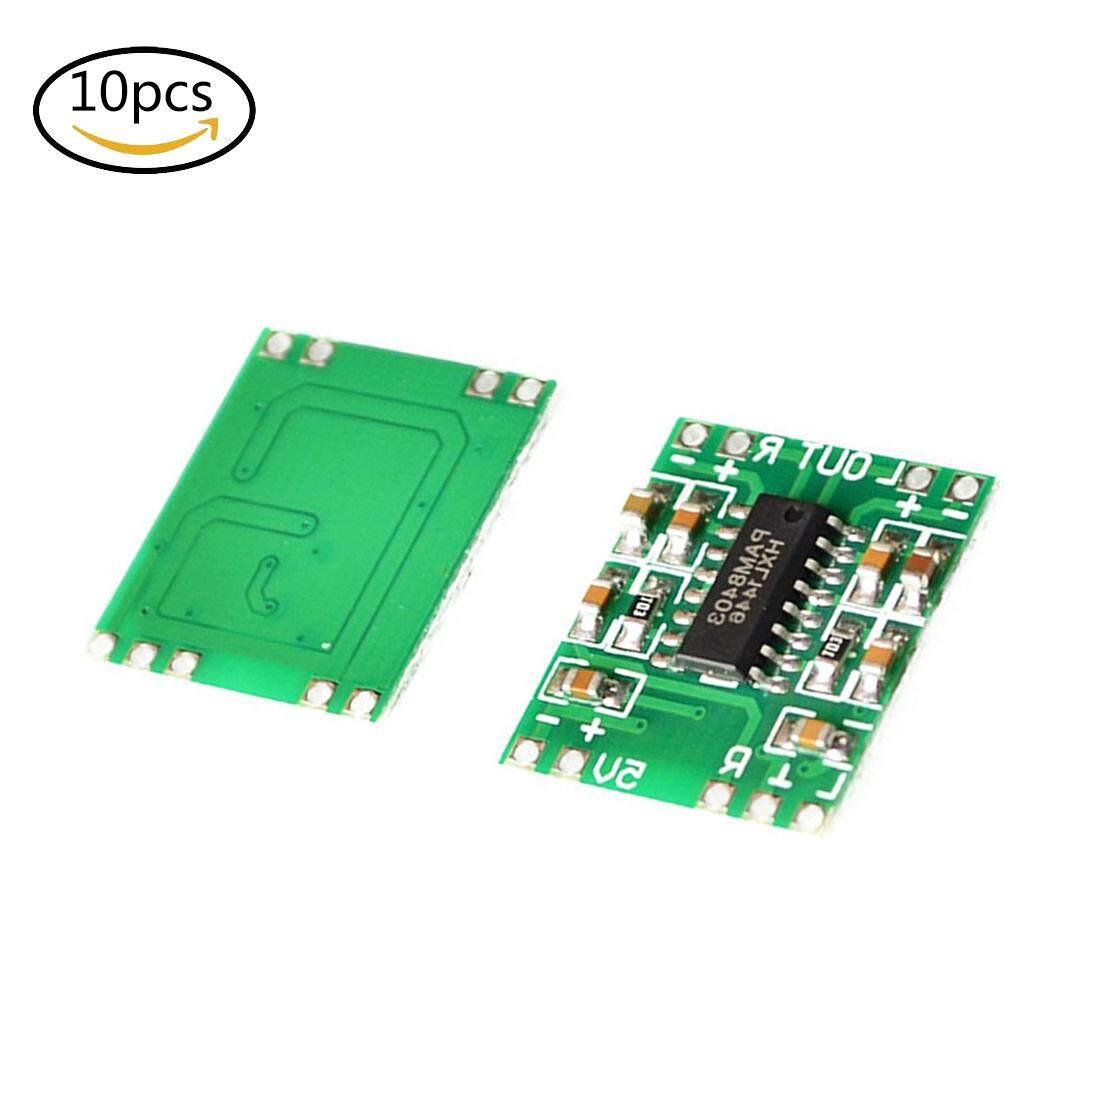 LT365 10Pcs PAM8403 Mini Digital Power Amplifier Board 2*3W Class D Audio  Module 2 5v-5V USB for Arduino - intl